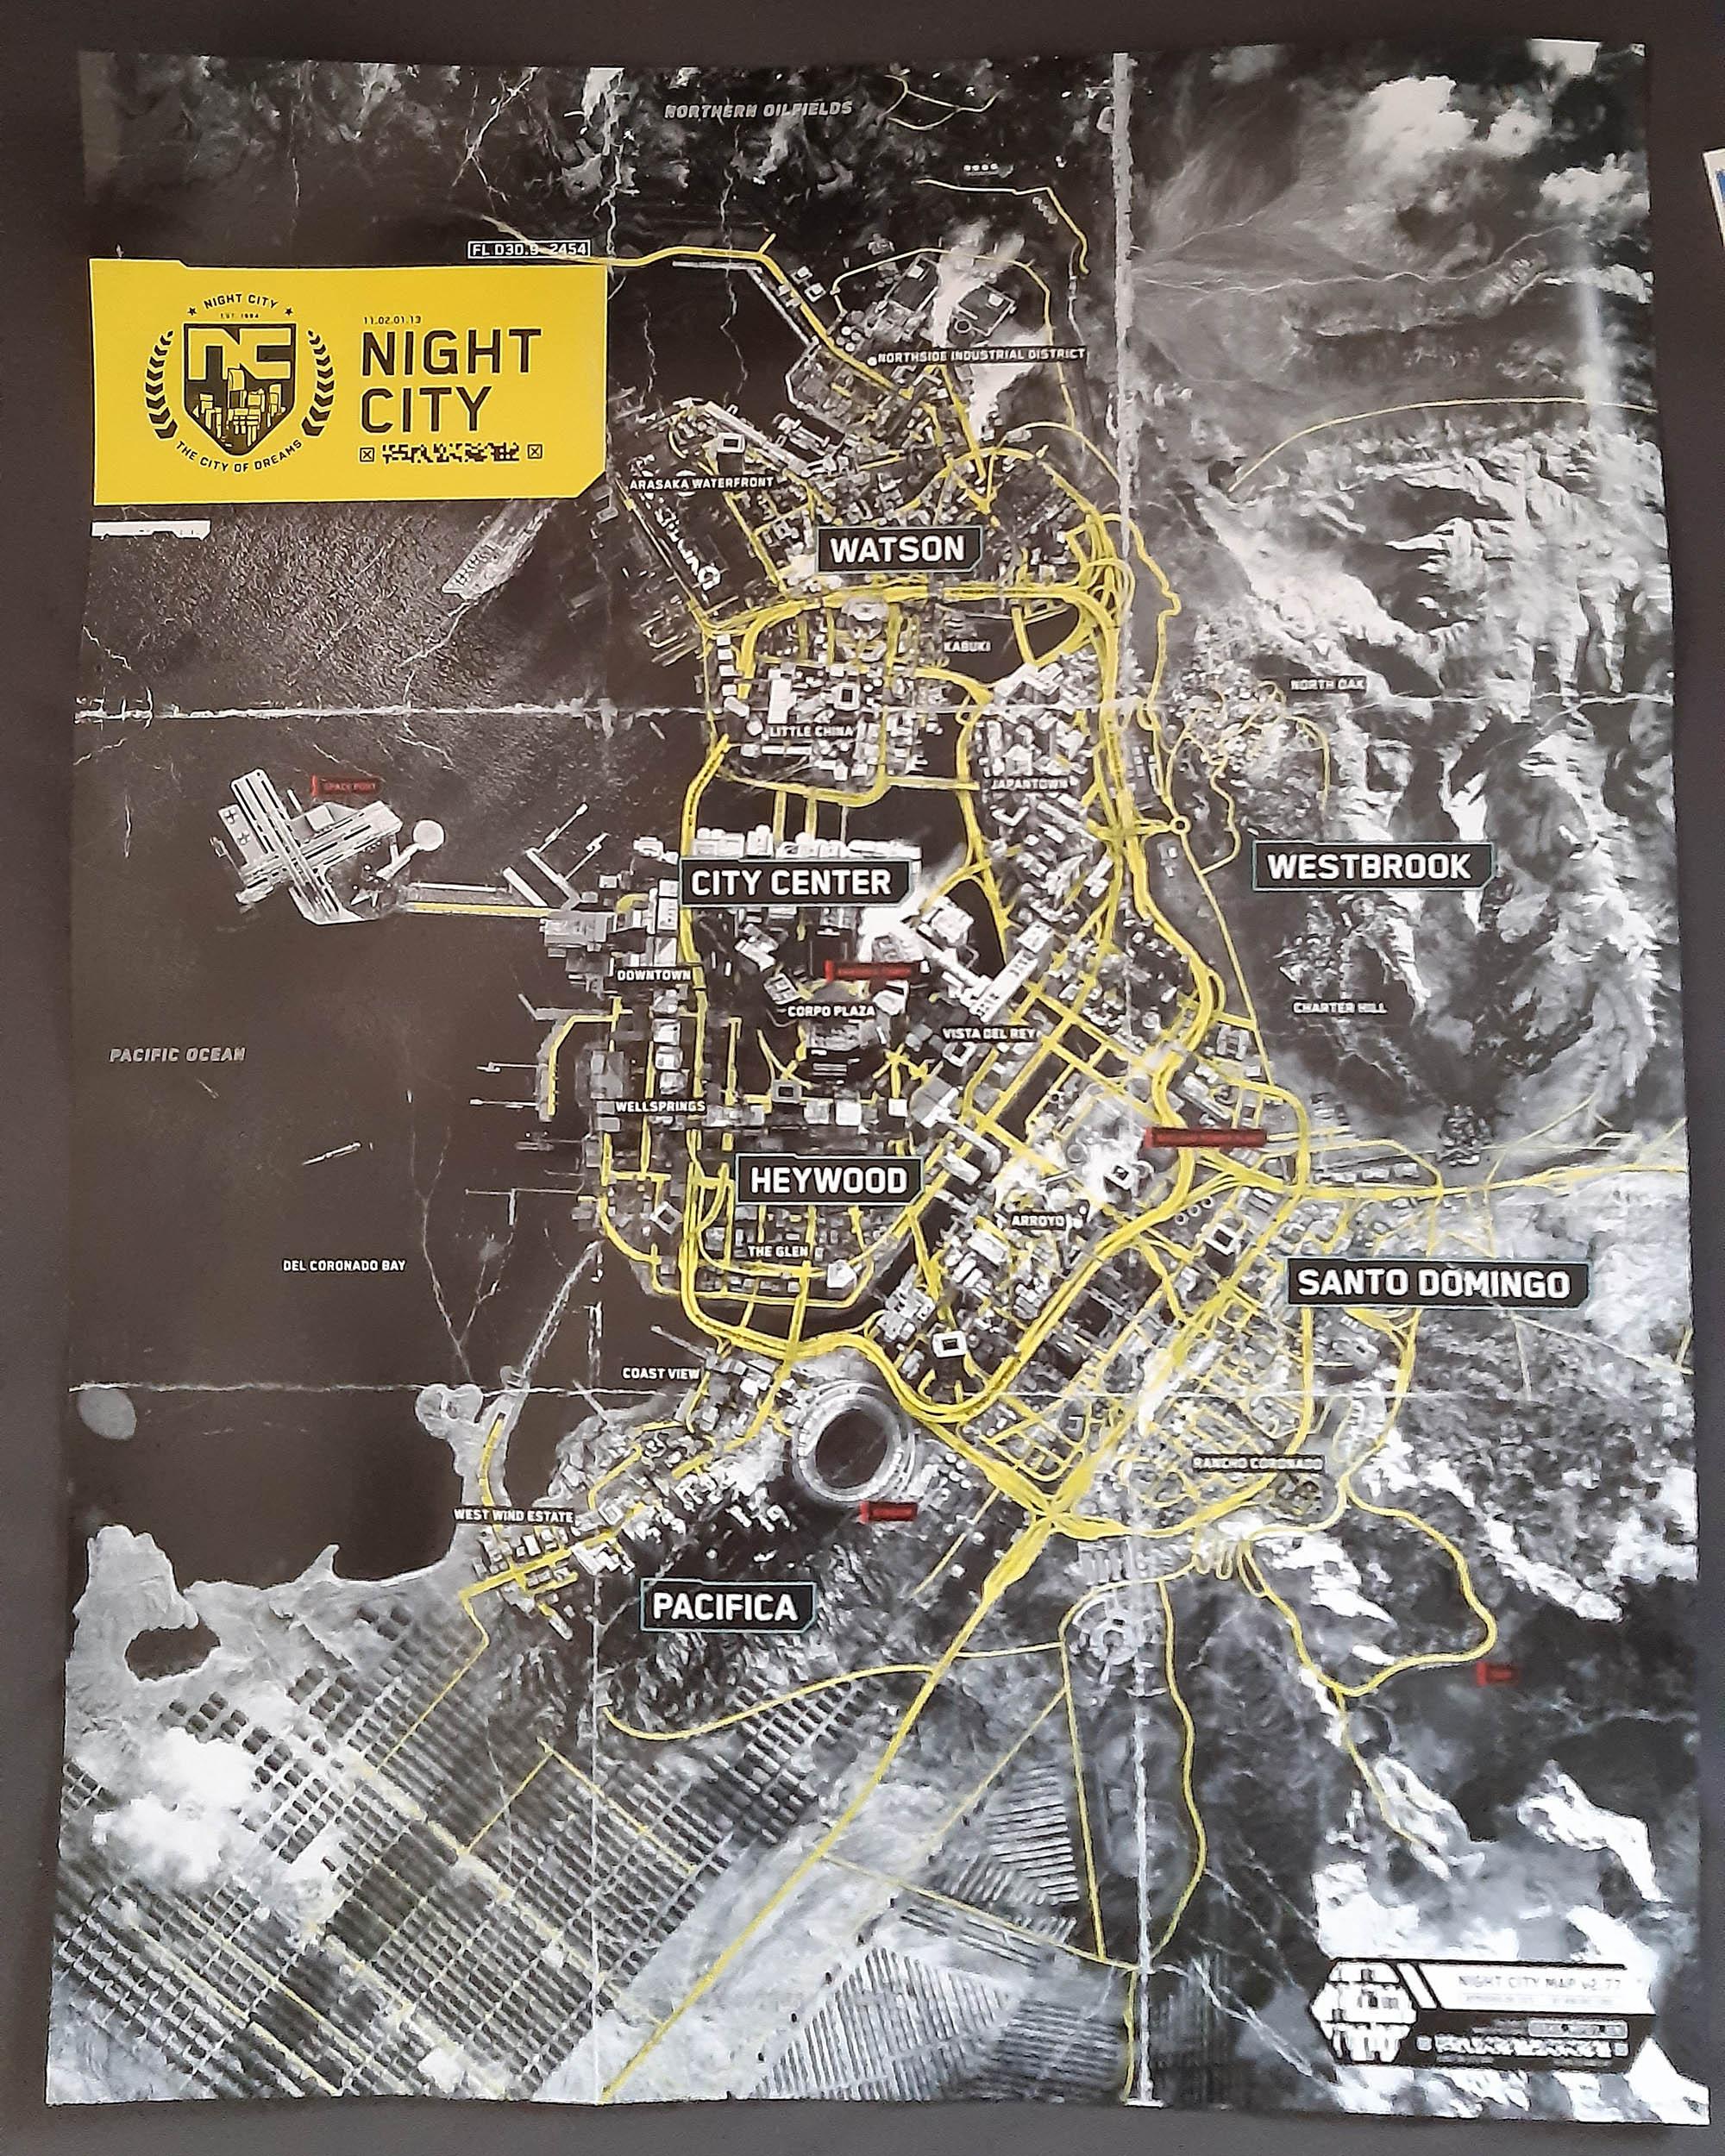 Cyberpunk 2077 leaked map